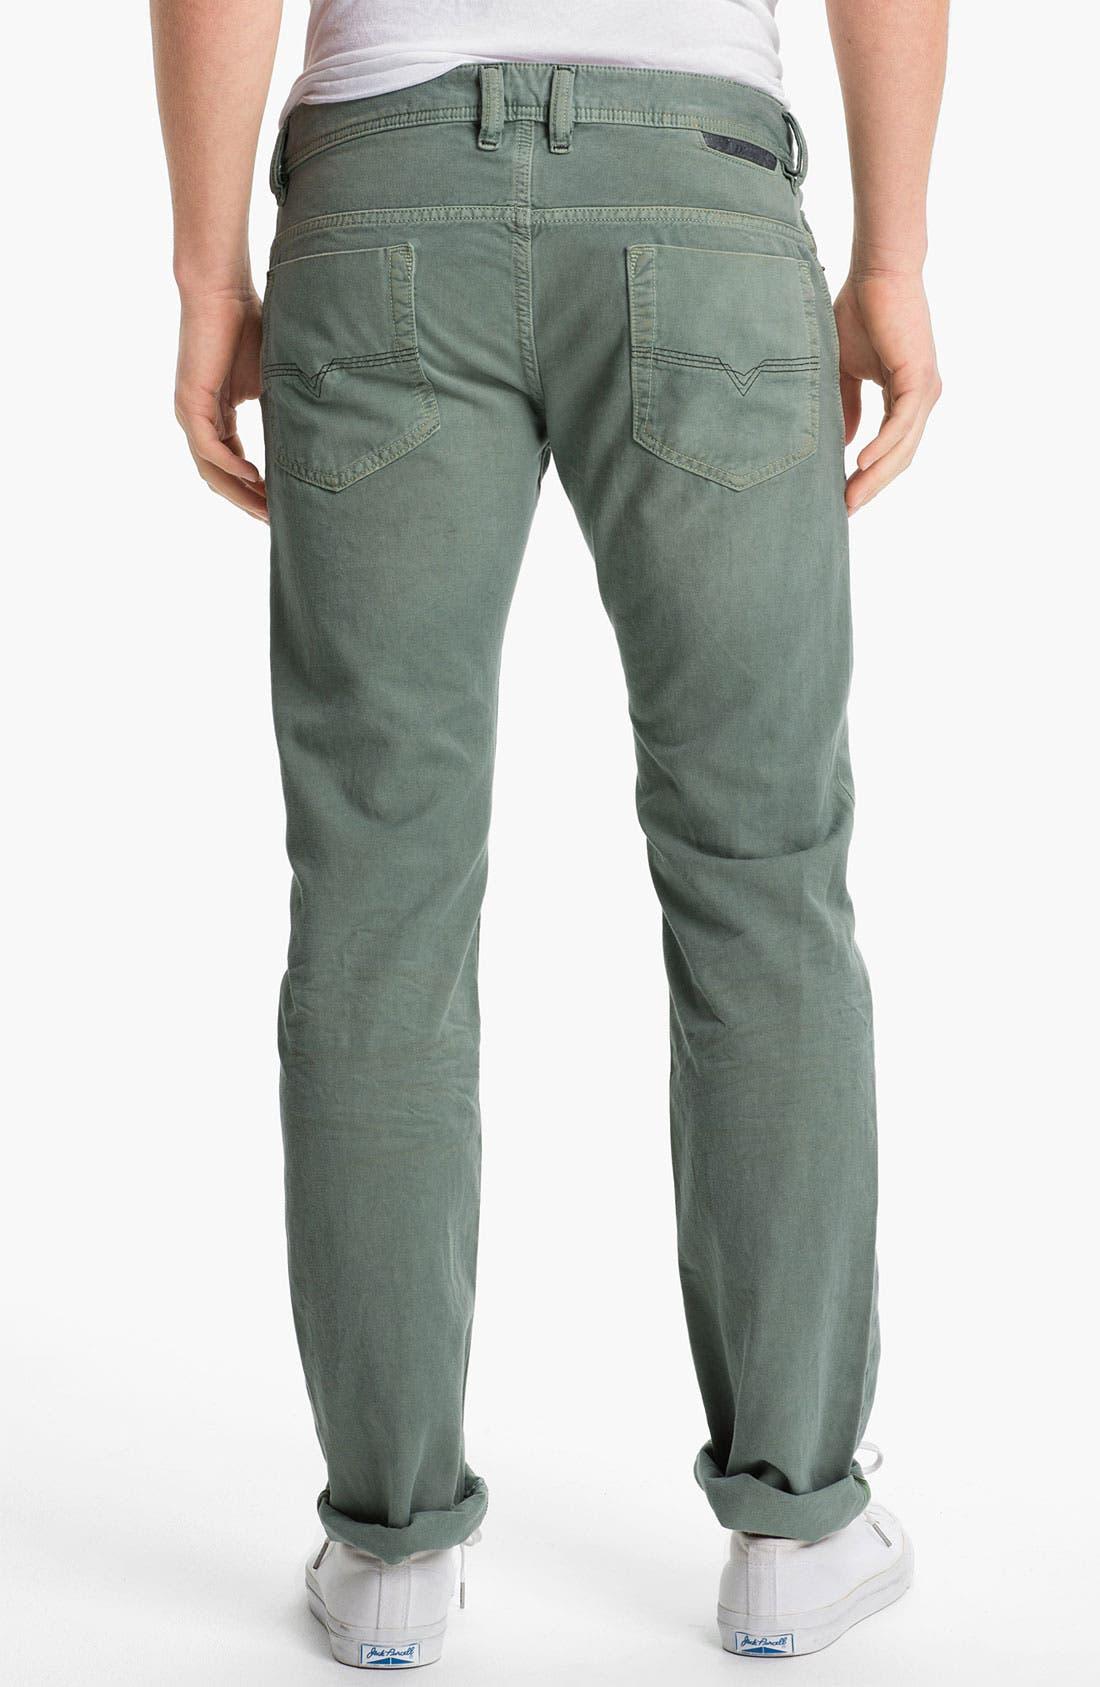 Alternate Image 1 Selected - DIESEL® 'Safado' Straight Leg Jeans